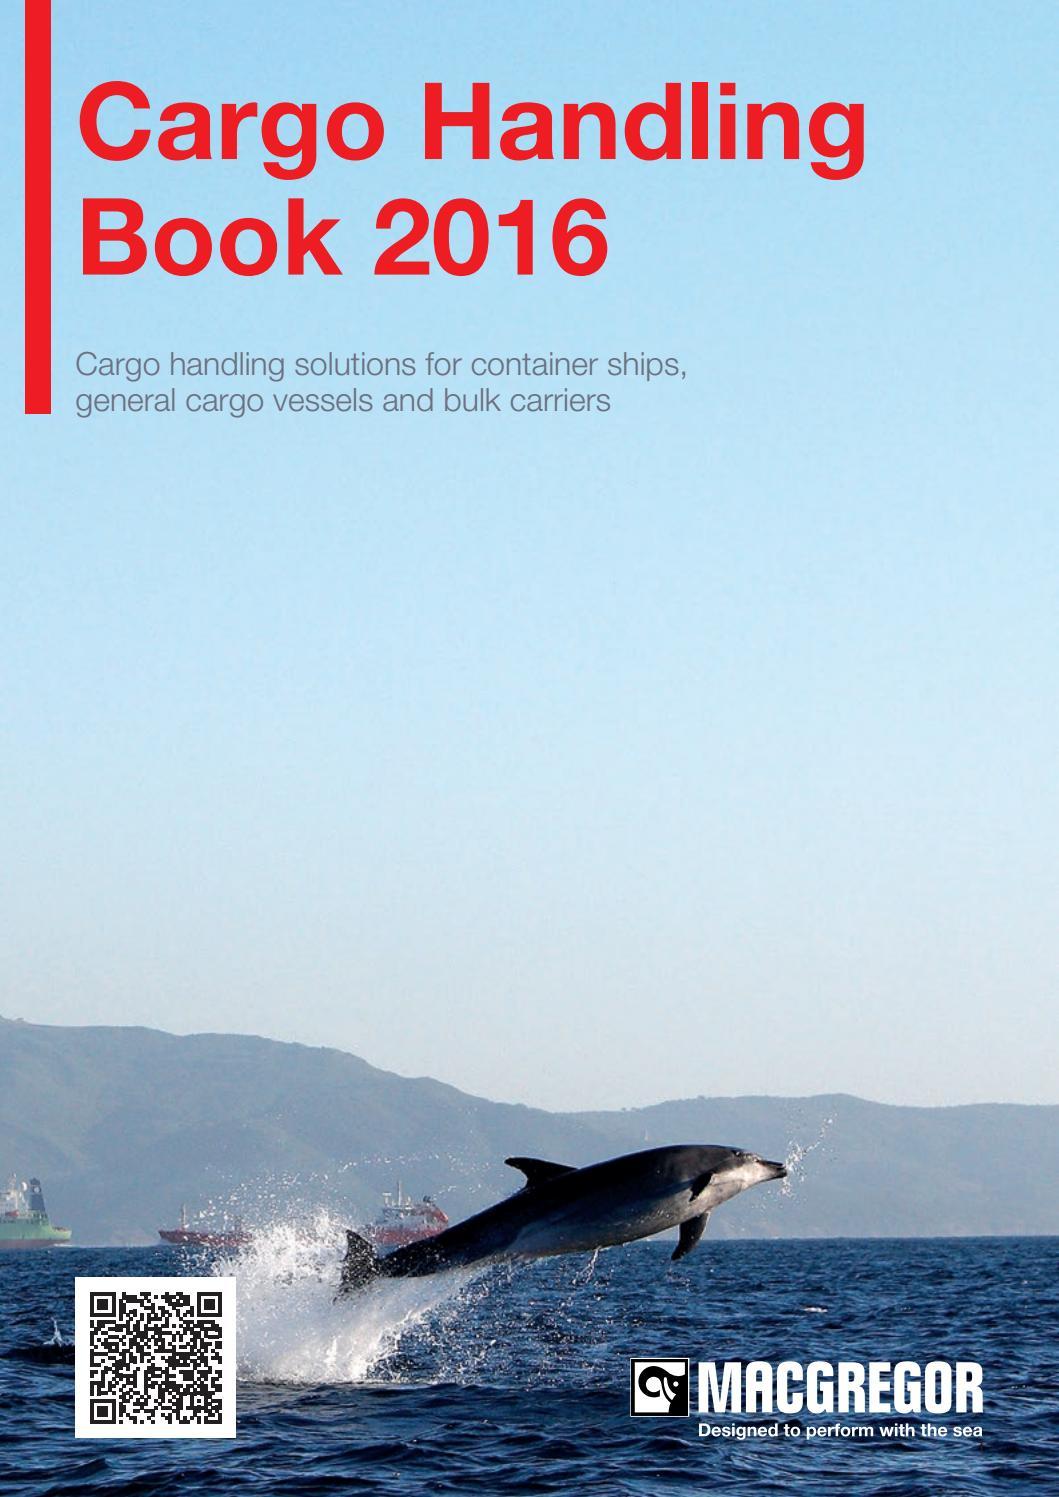 cargo handling book 2016 by cargotec